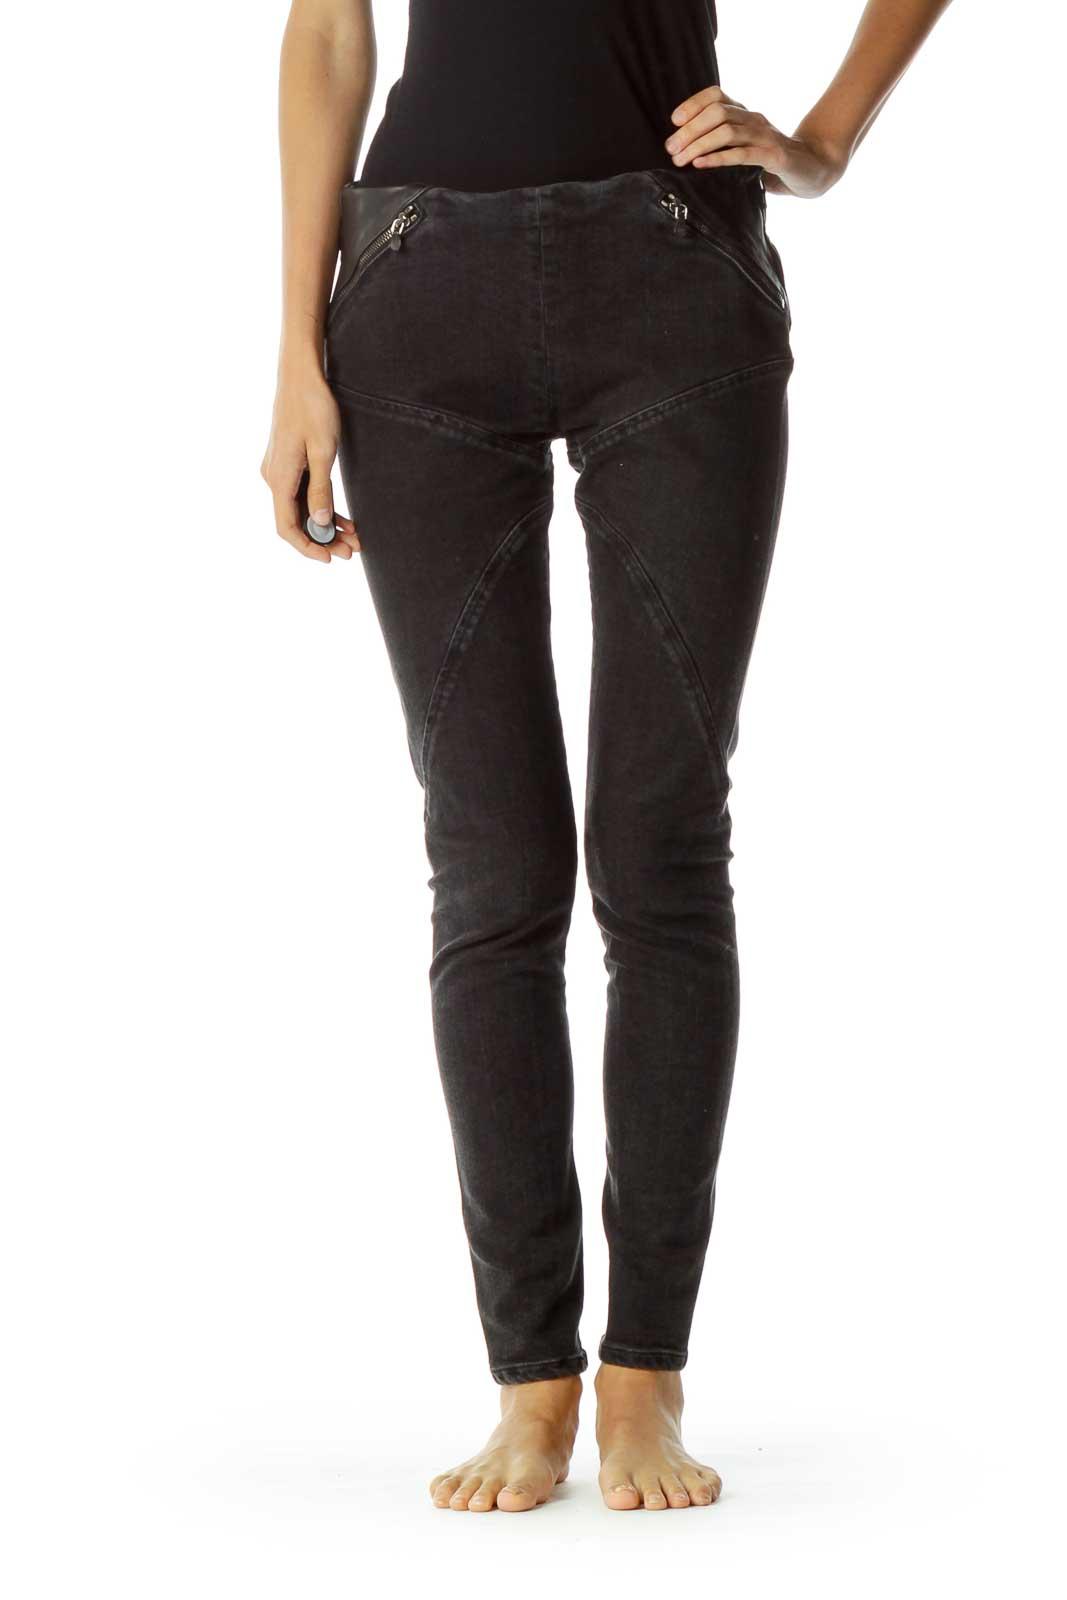 Black Leather Trim Zipper Detail Skinny Jeans Front